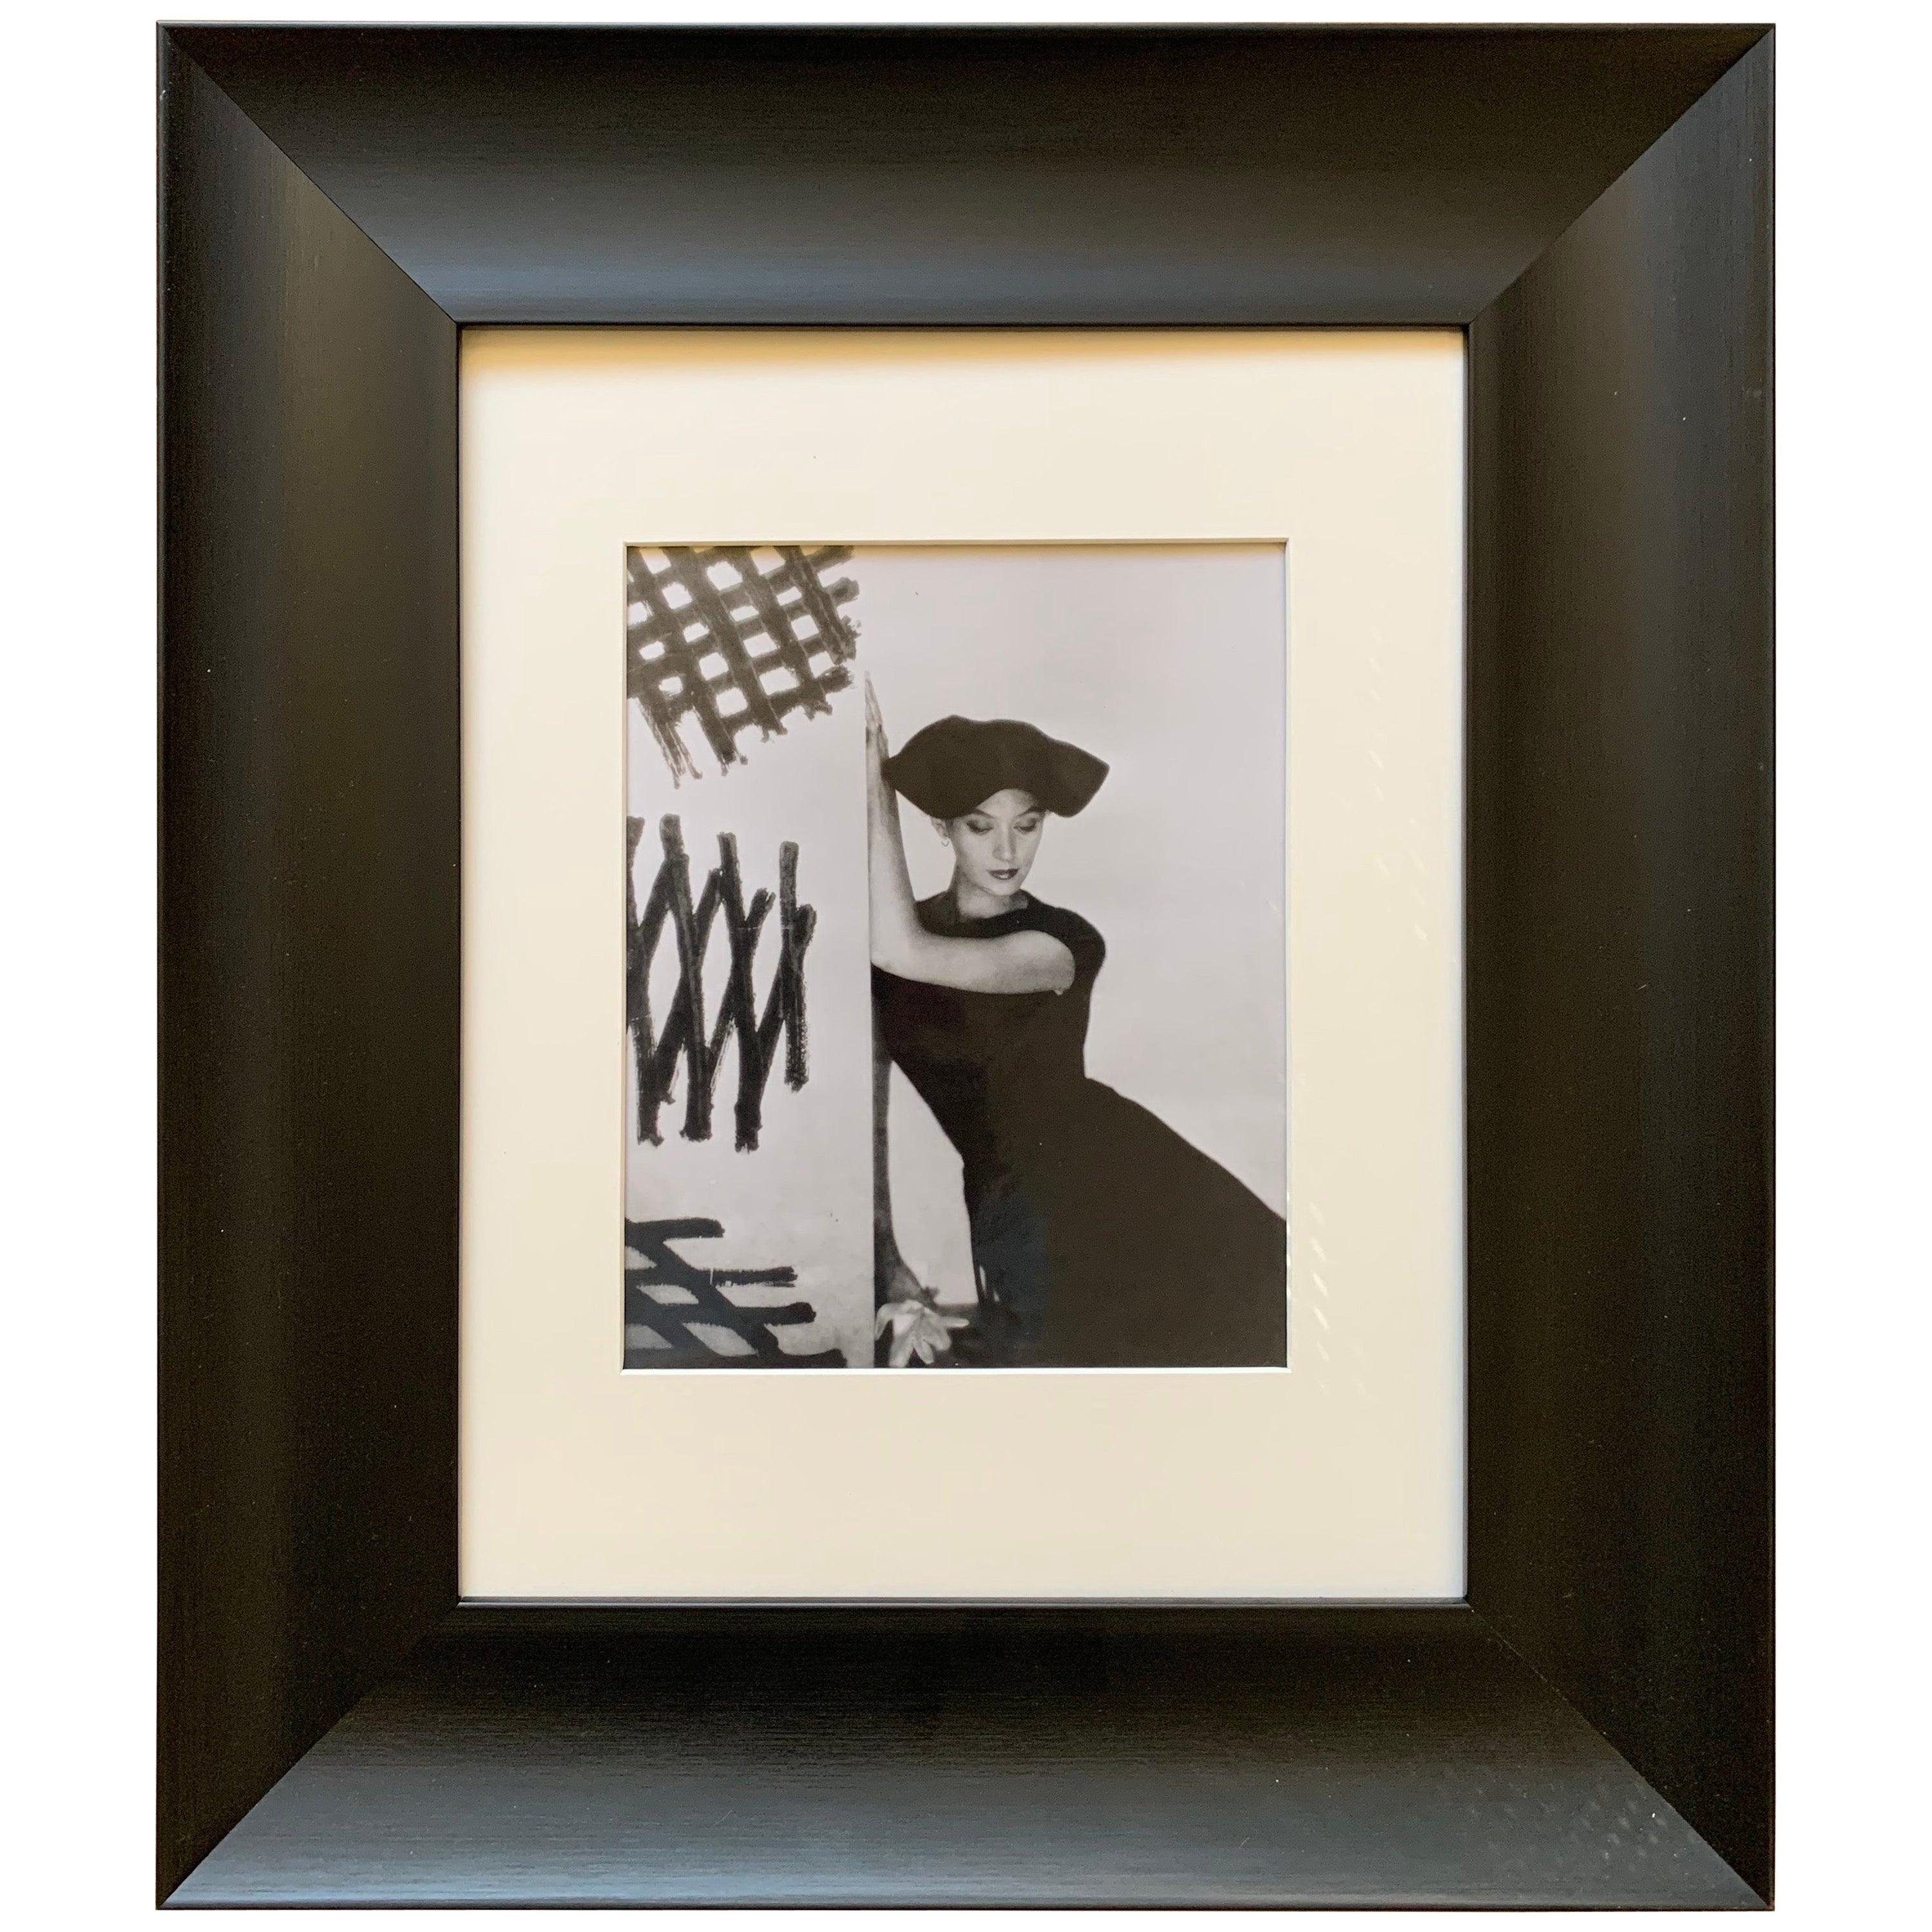 George Platt Lynes Original B&W Photograph from Vogue Magazine